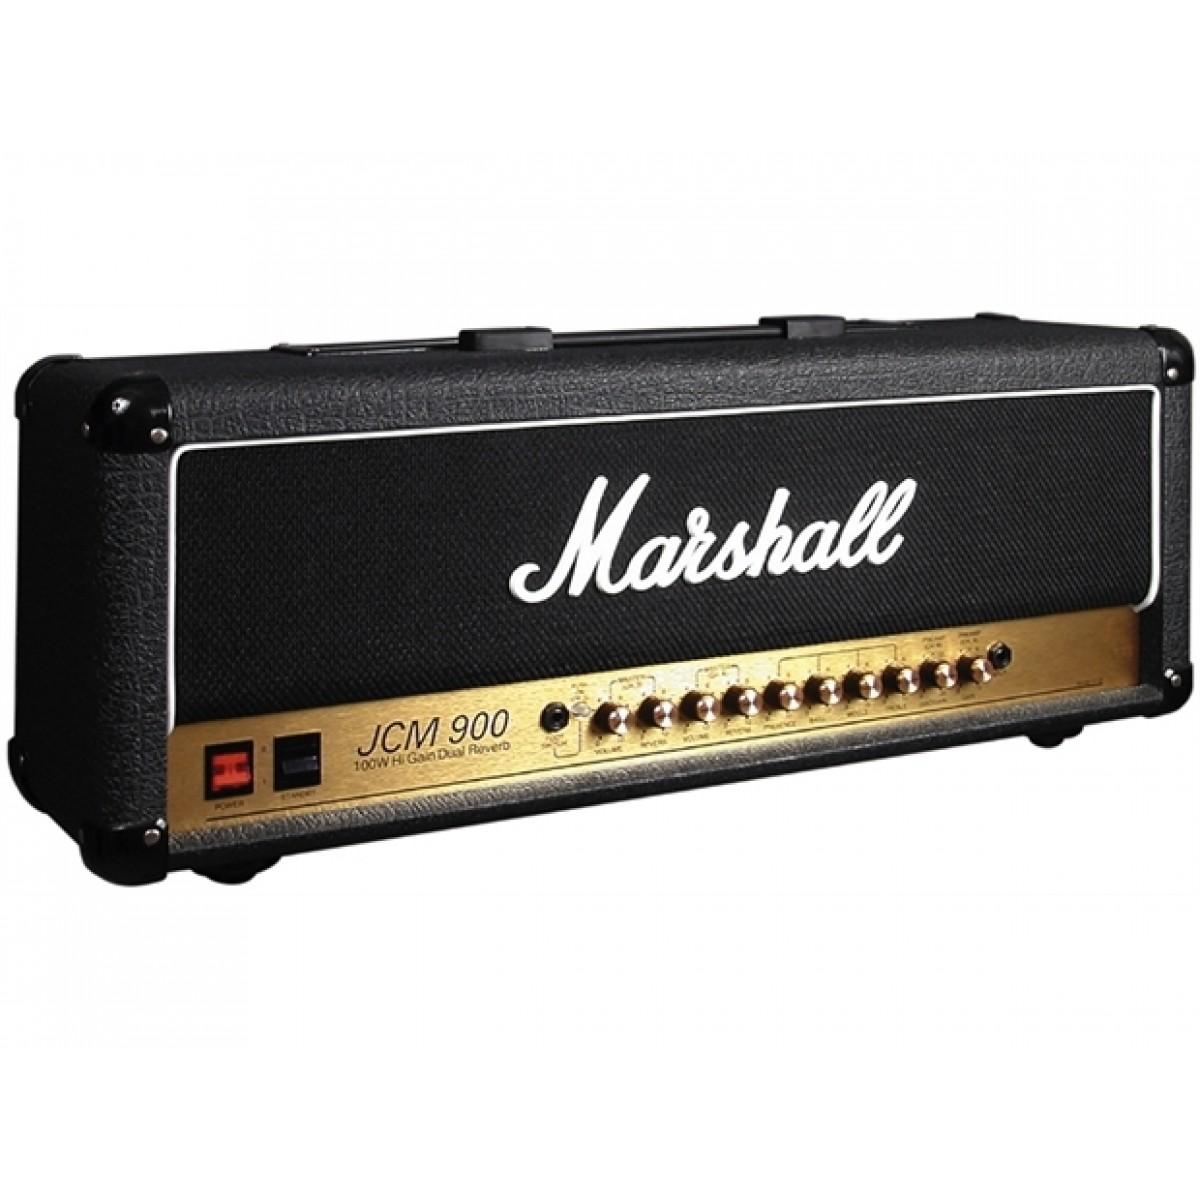 marshall 4100 jcm900 dual reverb 100w valve guitar amplifier head. Black Bedroom Furniture Sets. Home Design Ideas